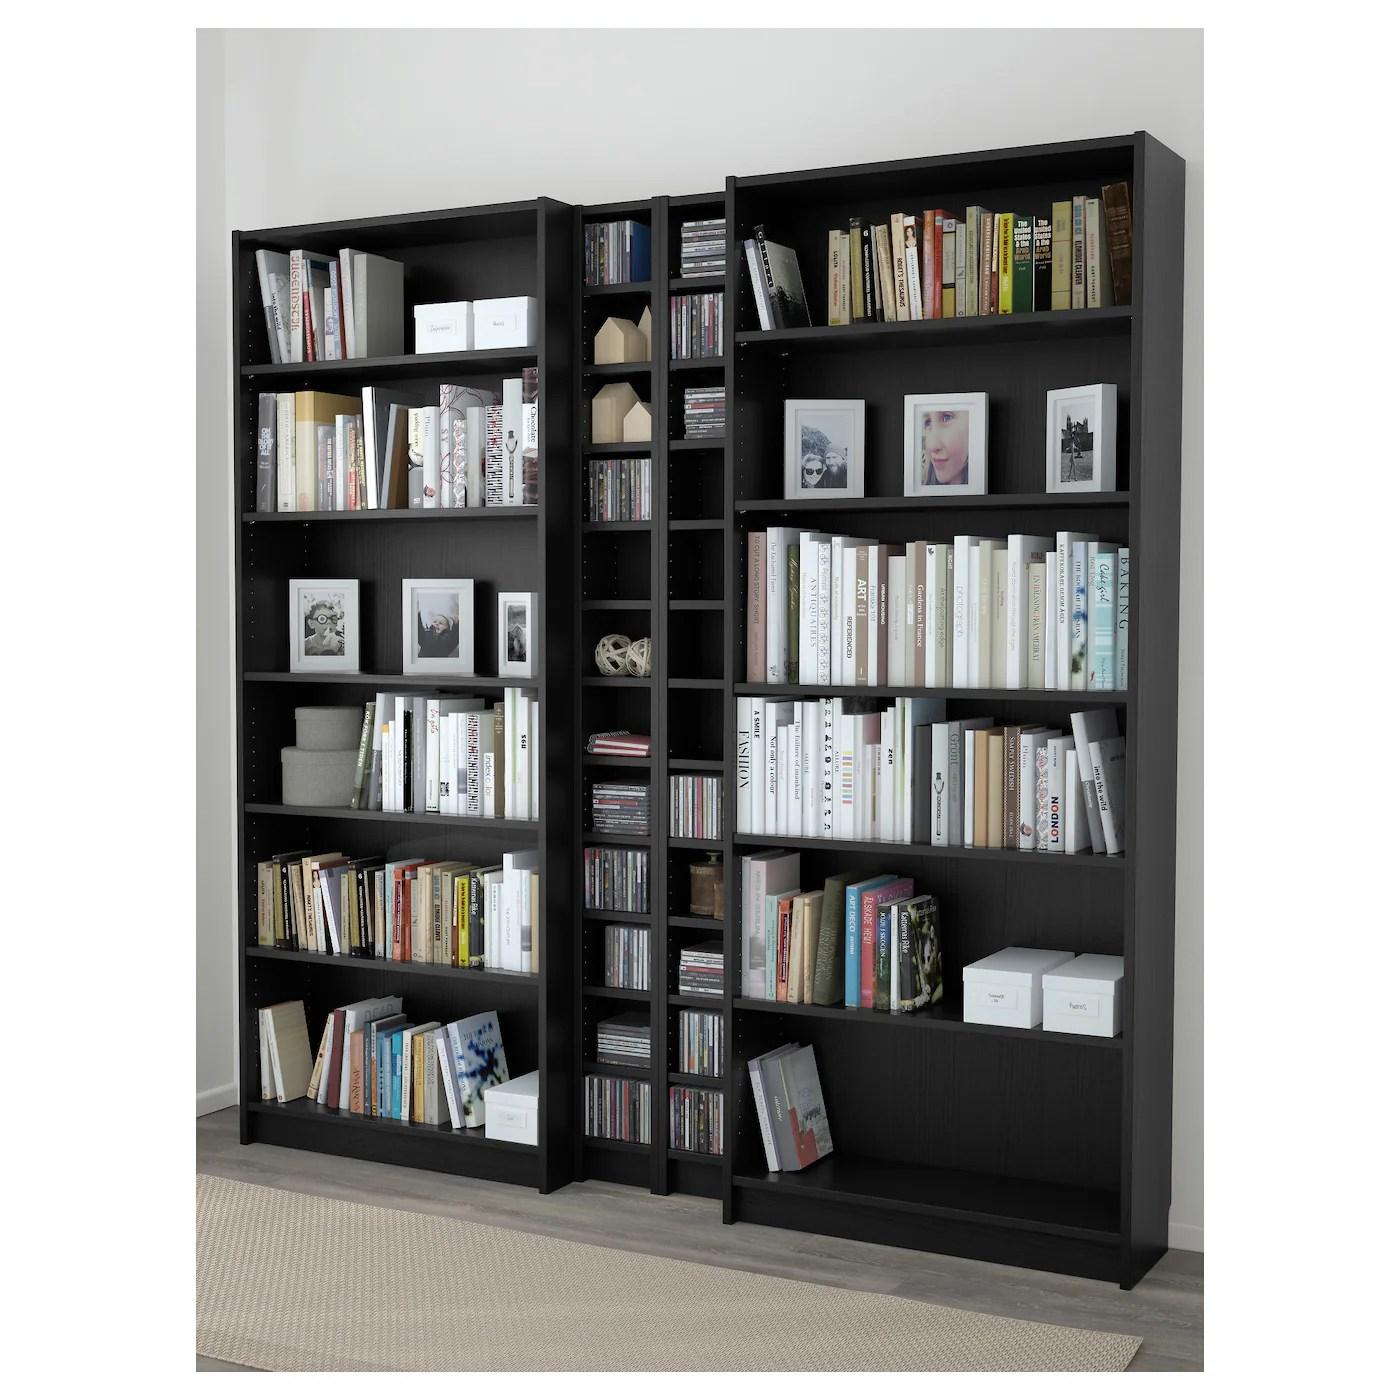 BILLYGNEDBY Bookcase Black Brown 200 X 202 X 28 Cm IKEA